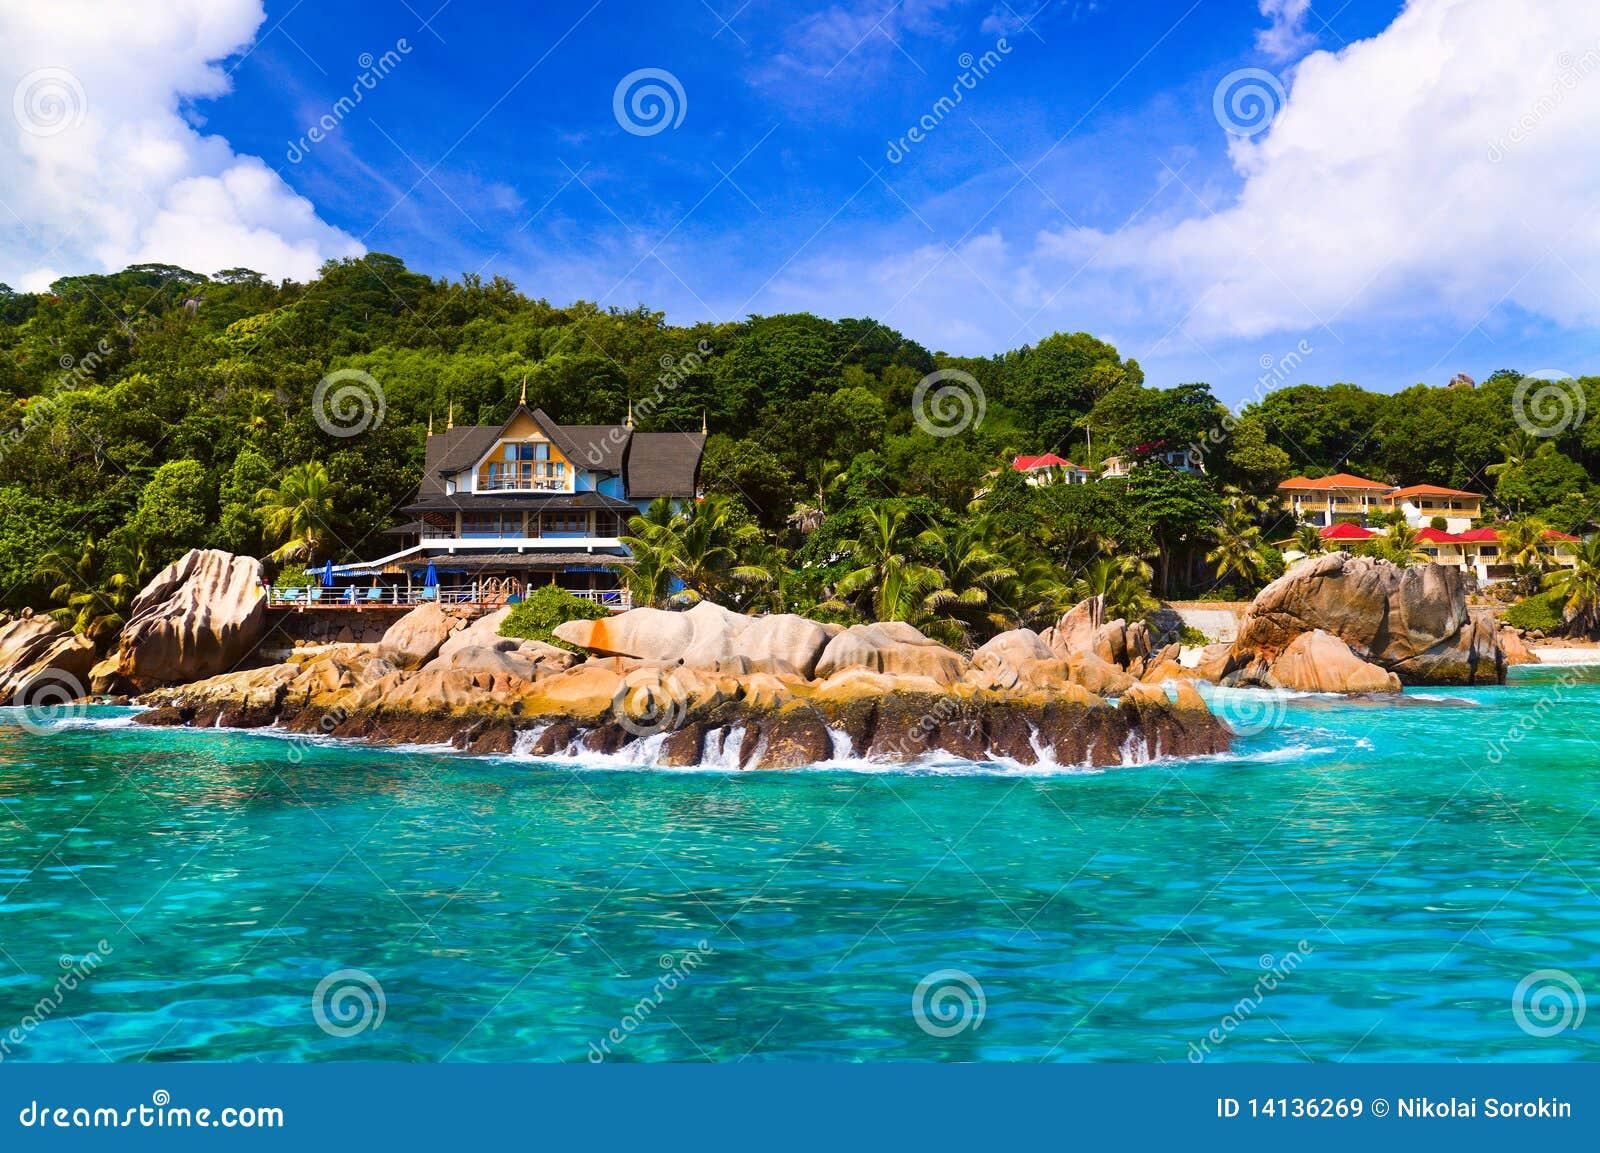 Hotel am tropischen strand la digue seychellen stockbild for Designhotel am strand